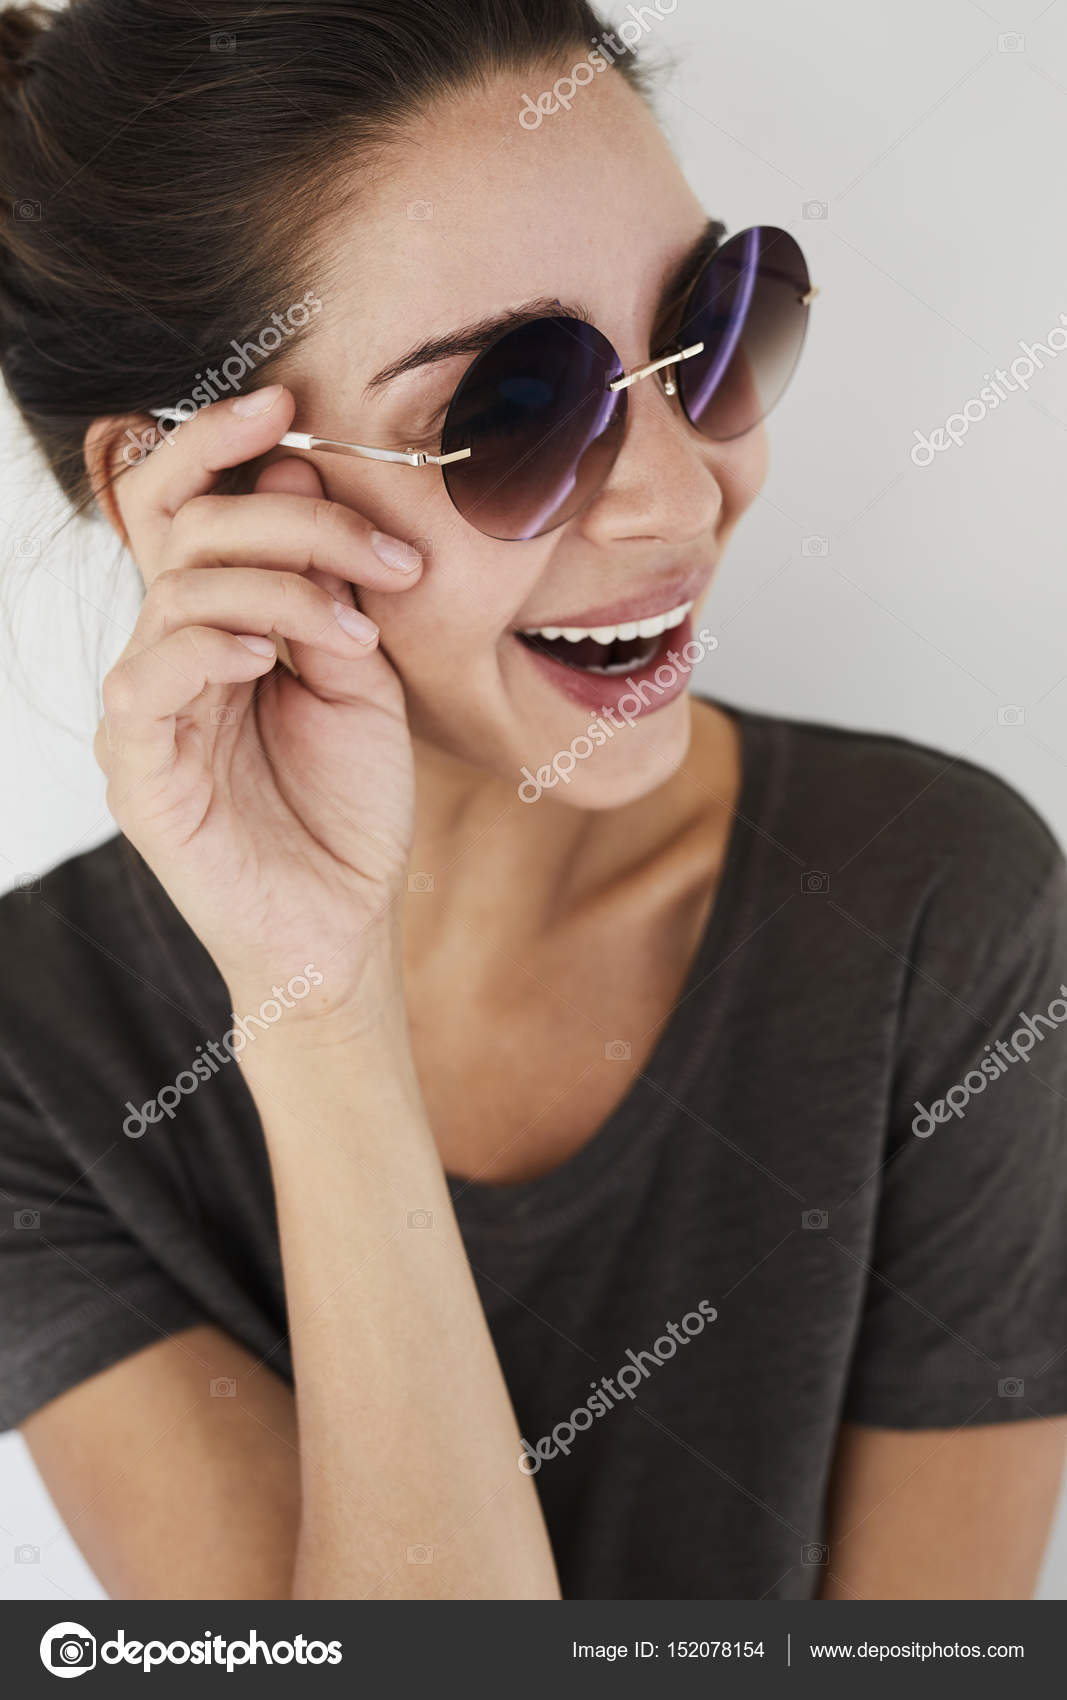 83373c1e6a μελαχρινή γυναίκα γέλιο — Φωτογραφία Αρχείου © sanneberg  152078154